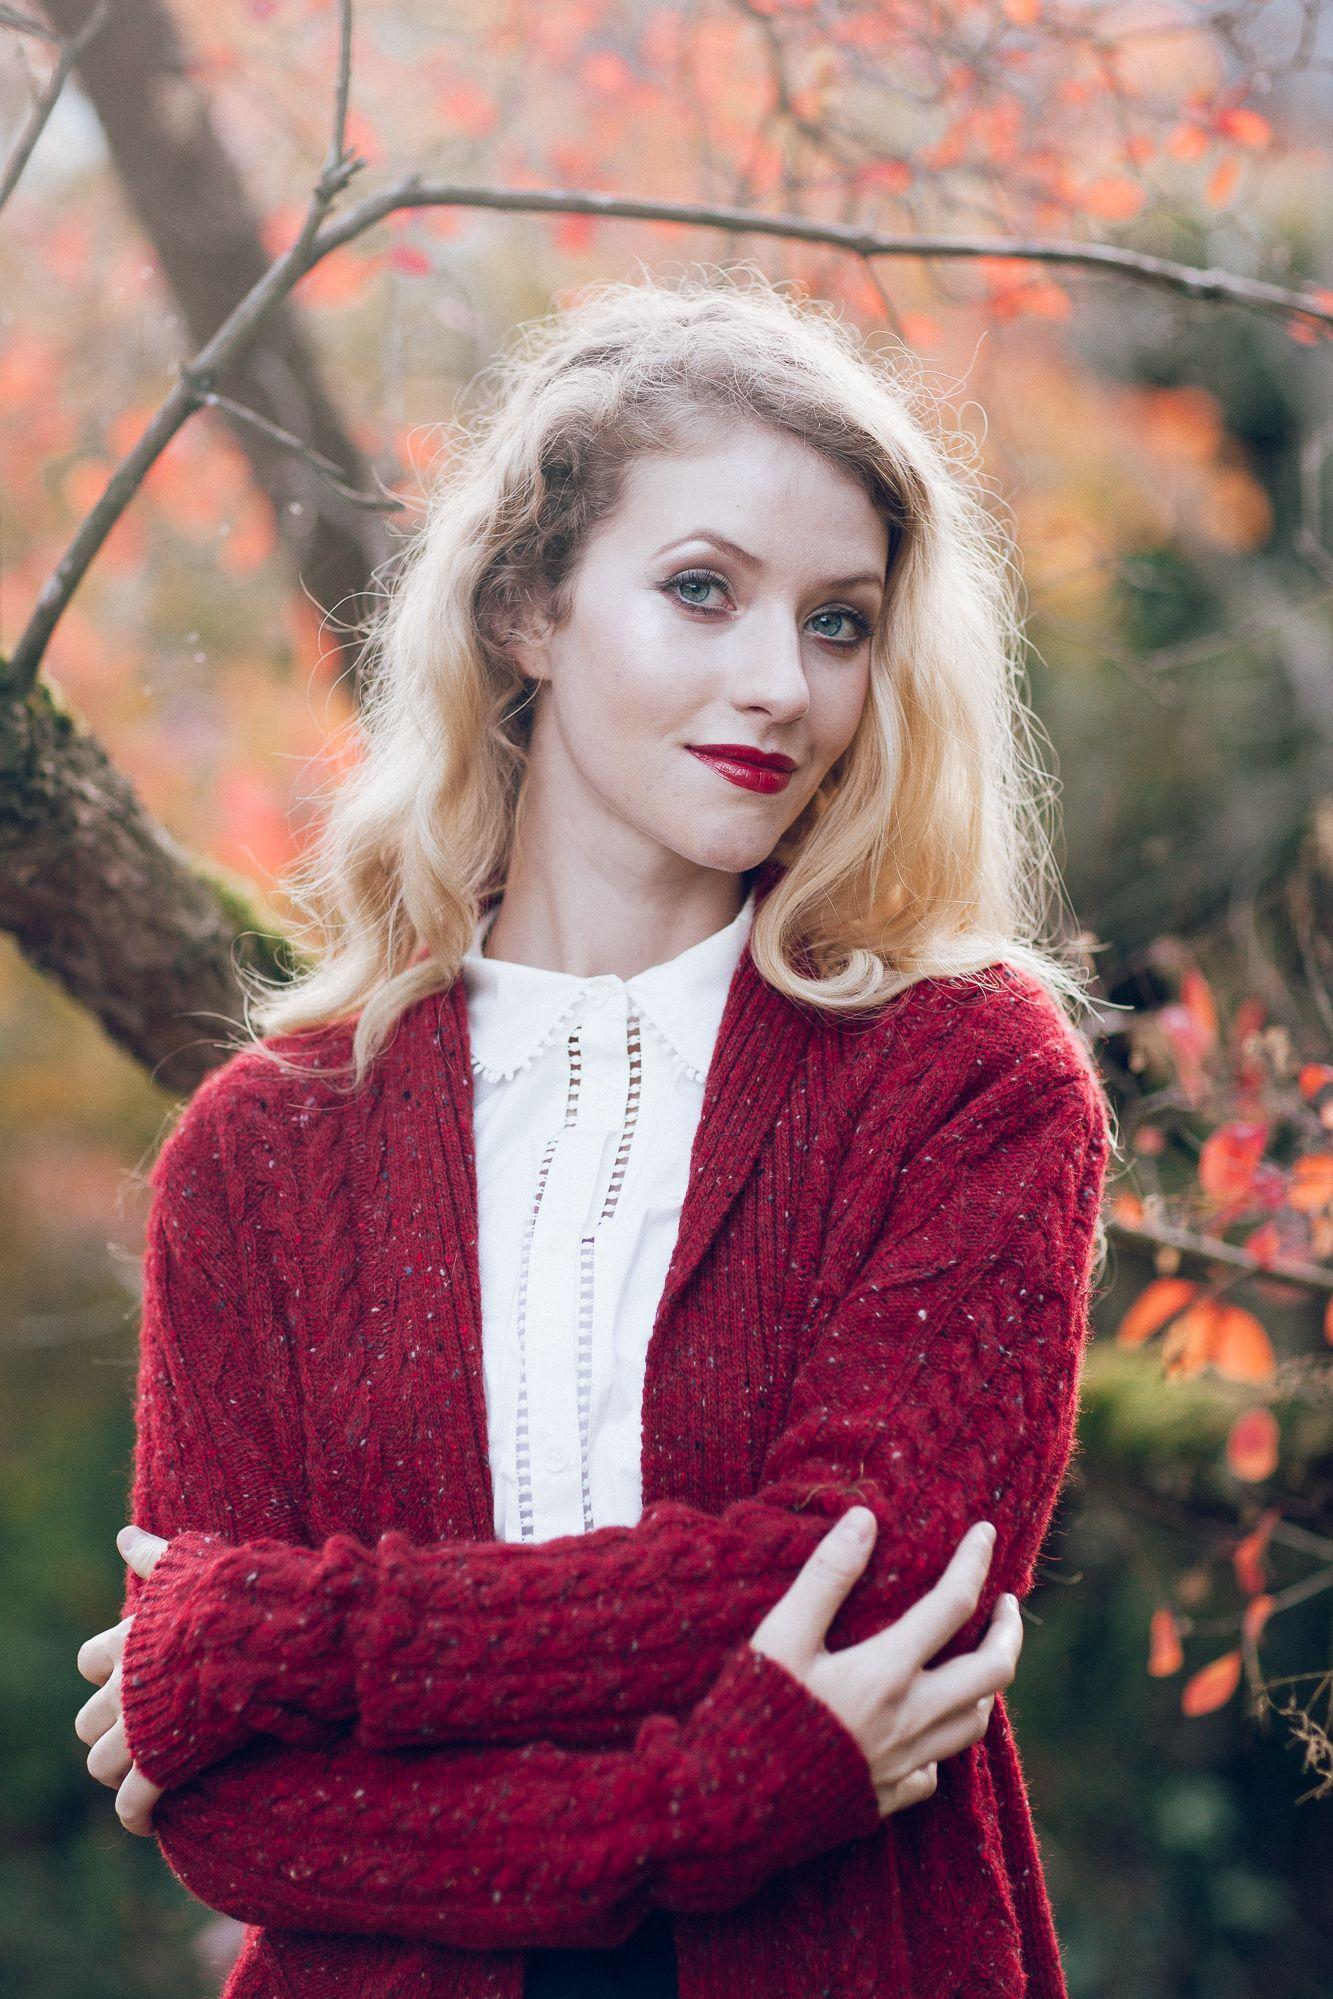 Aran cardigan knitted jacket red Knit cardigan, Aran